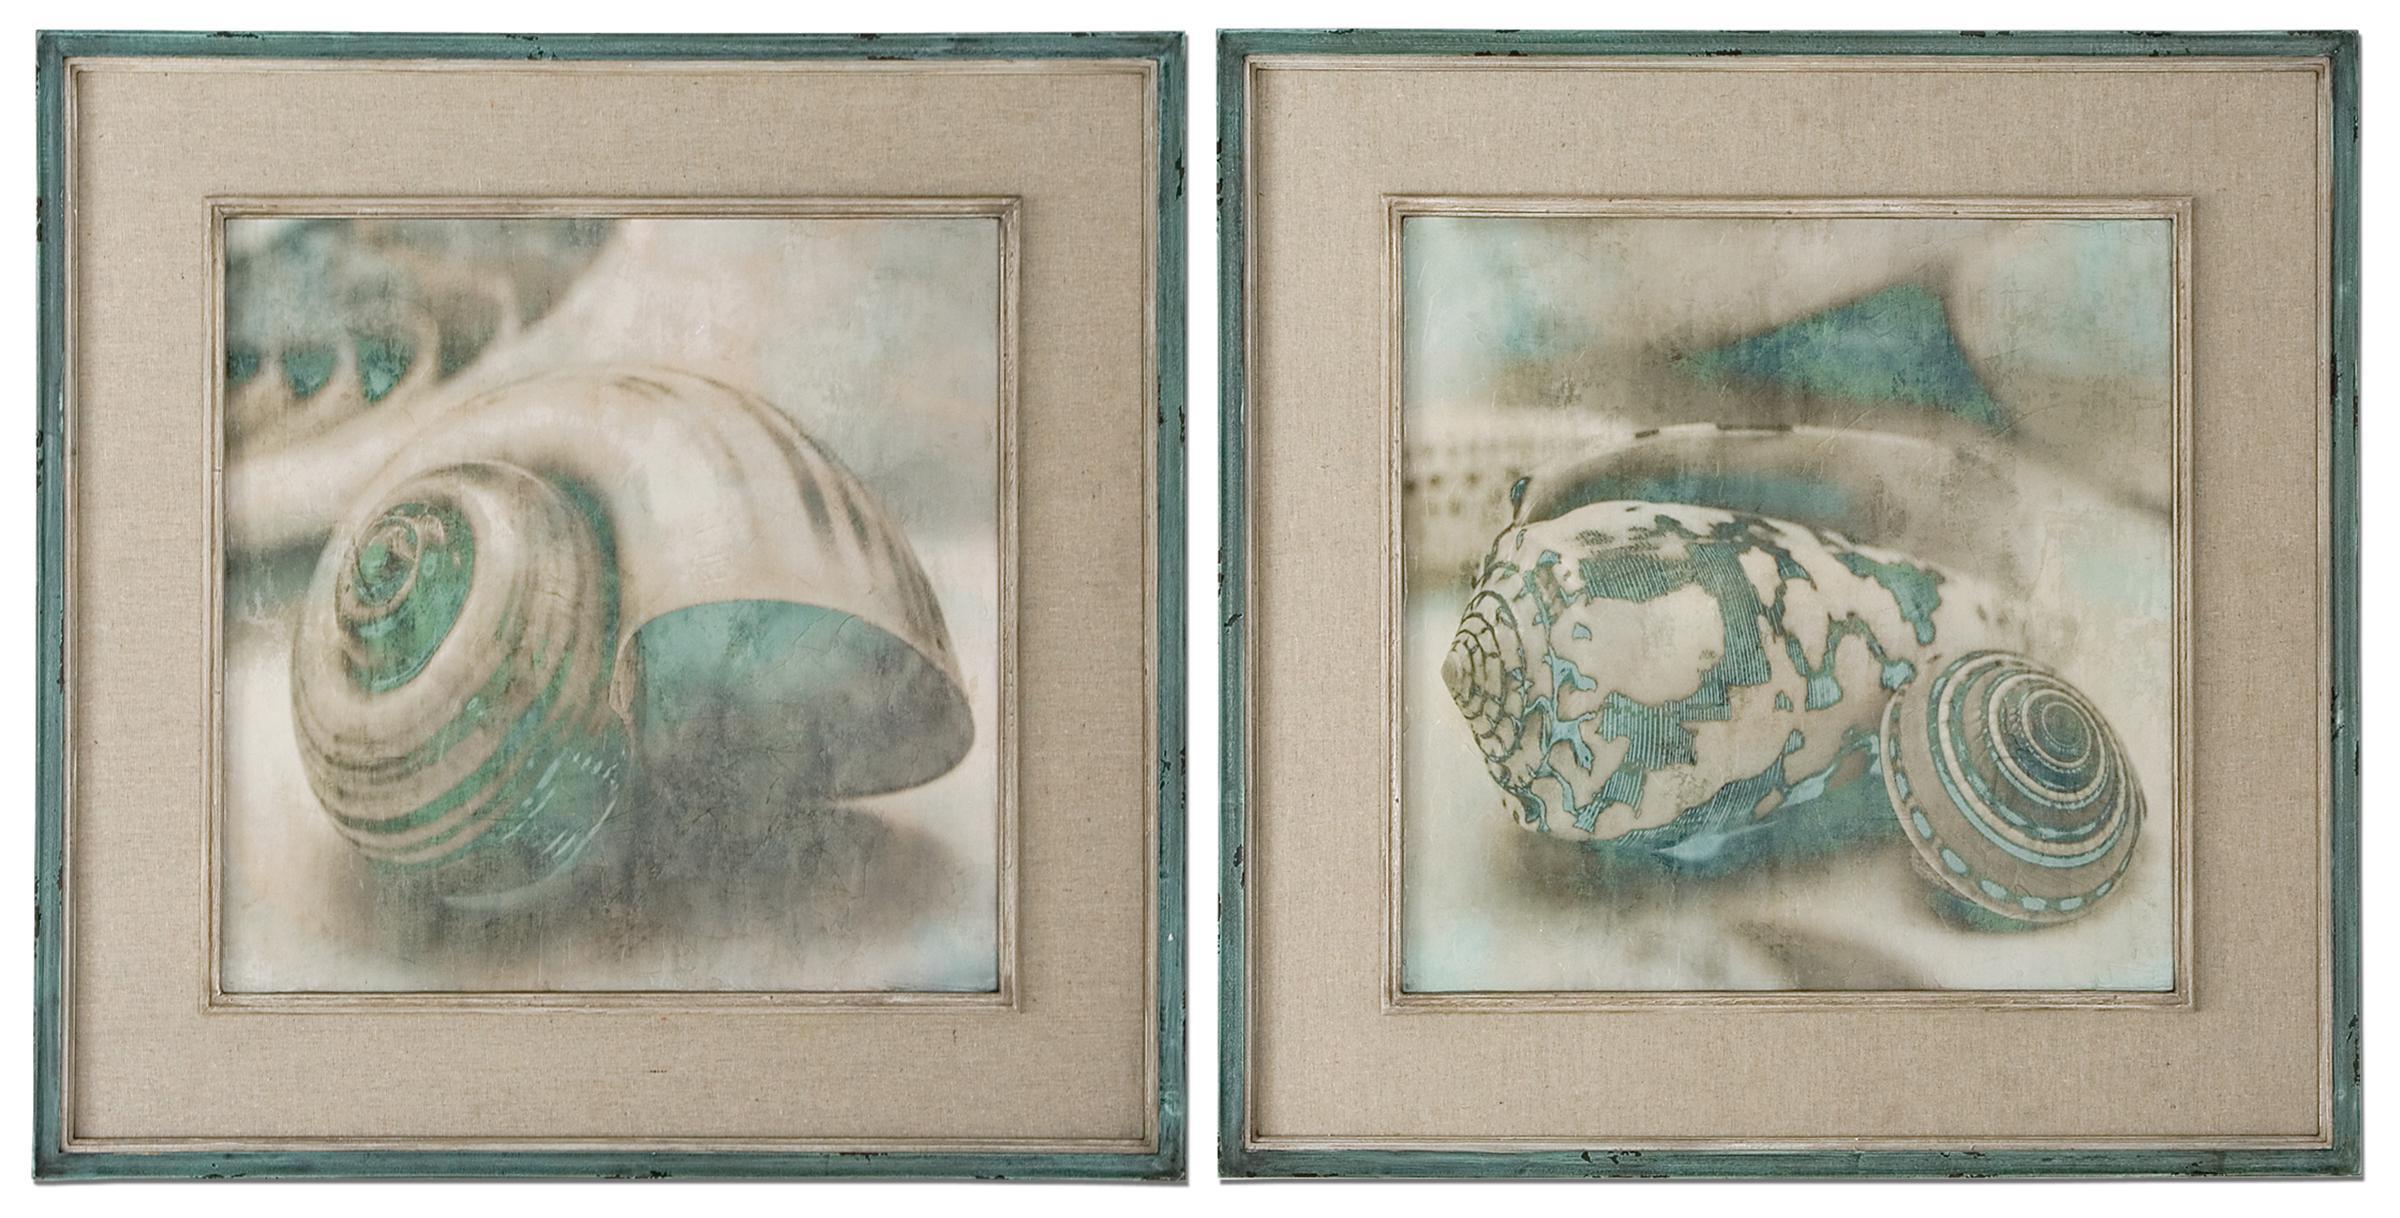 Uttermost Art Coastal Gems - Item Number: 51084